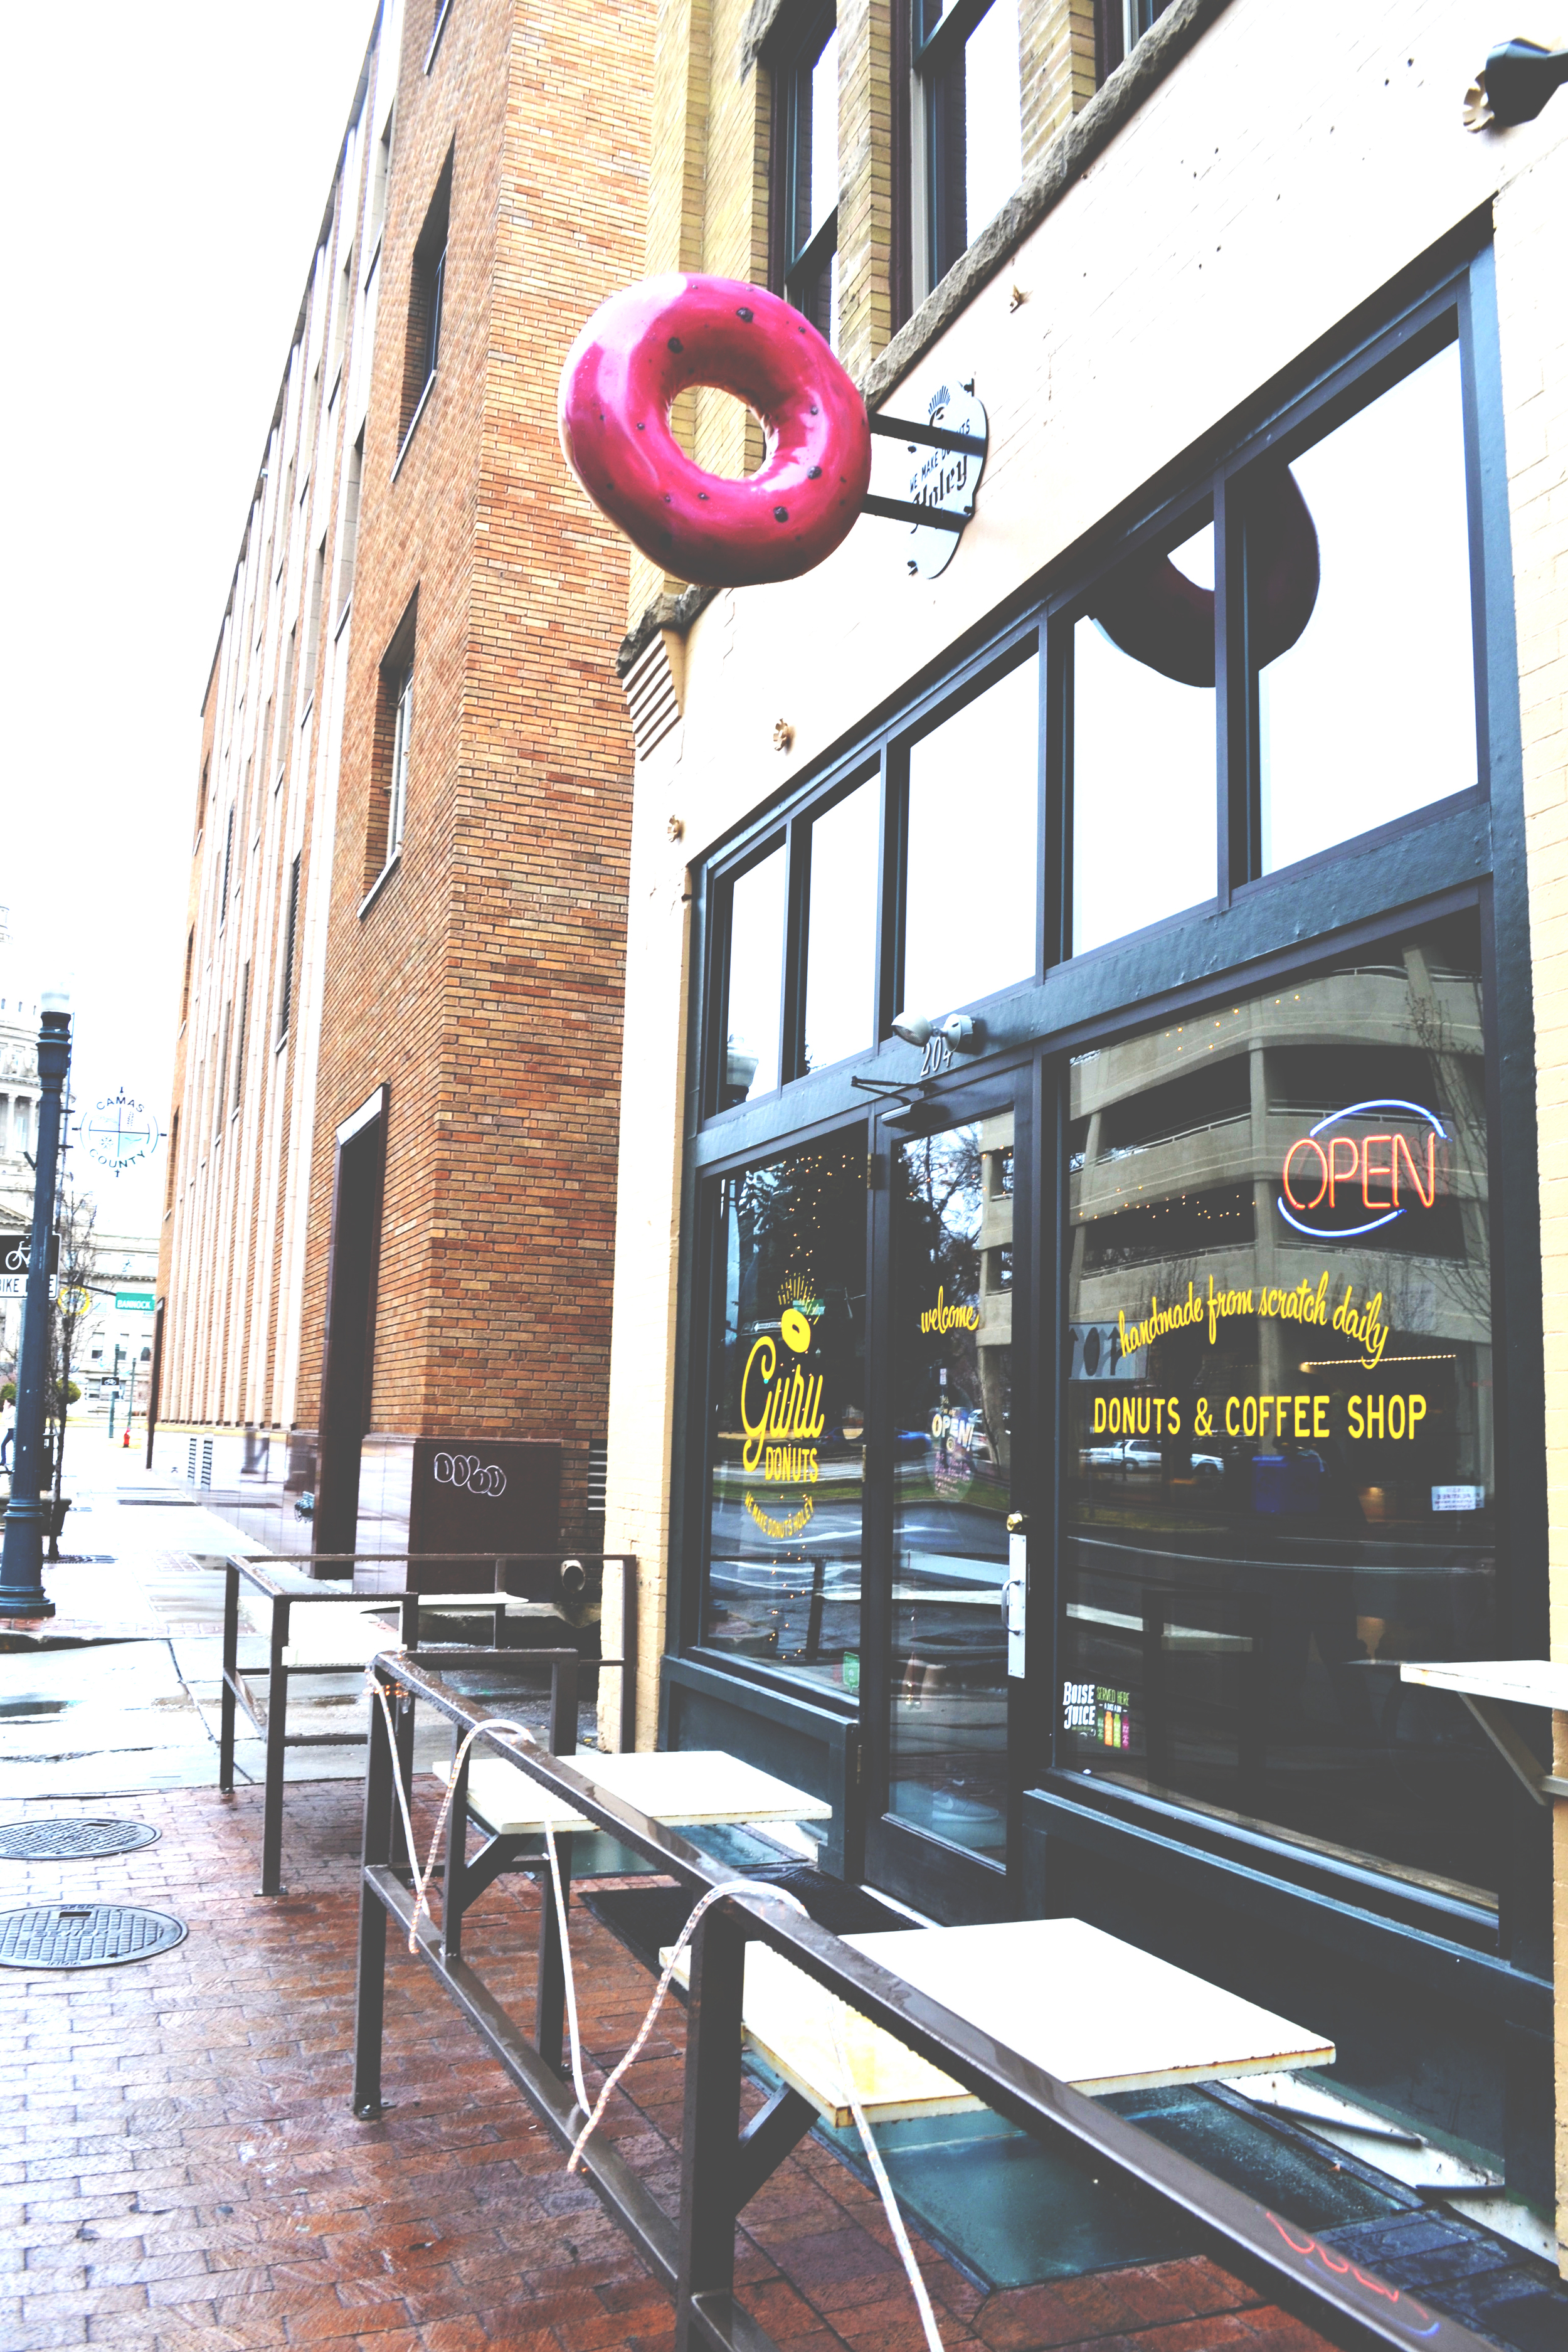 Guru Donuts  | Boise, ID | 204 N. Capital Blvd. | All Rights Reserved: Heather Woolery 2016